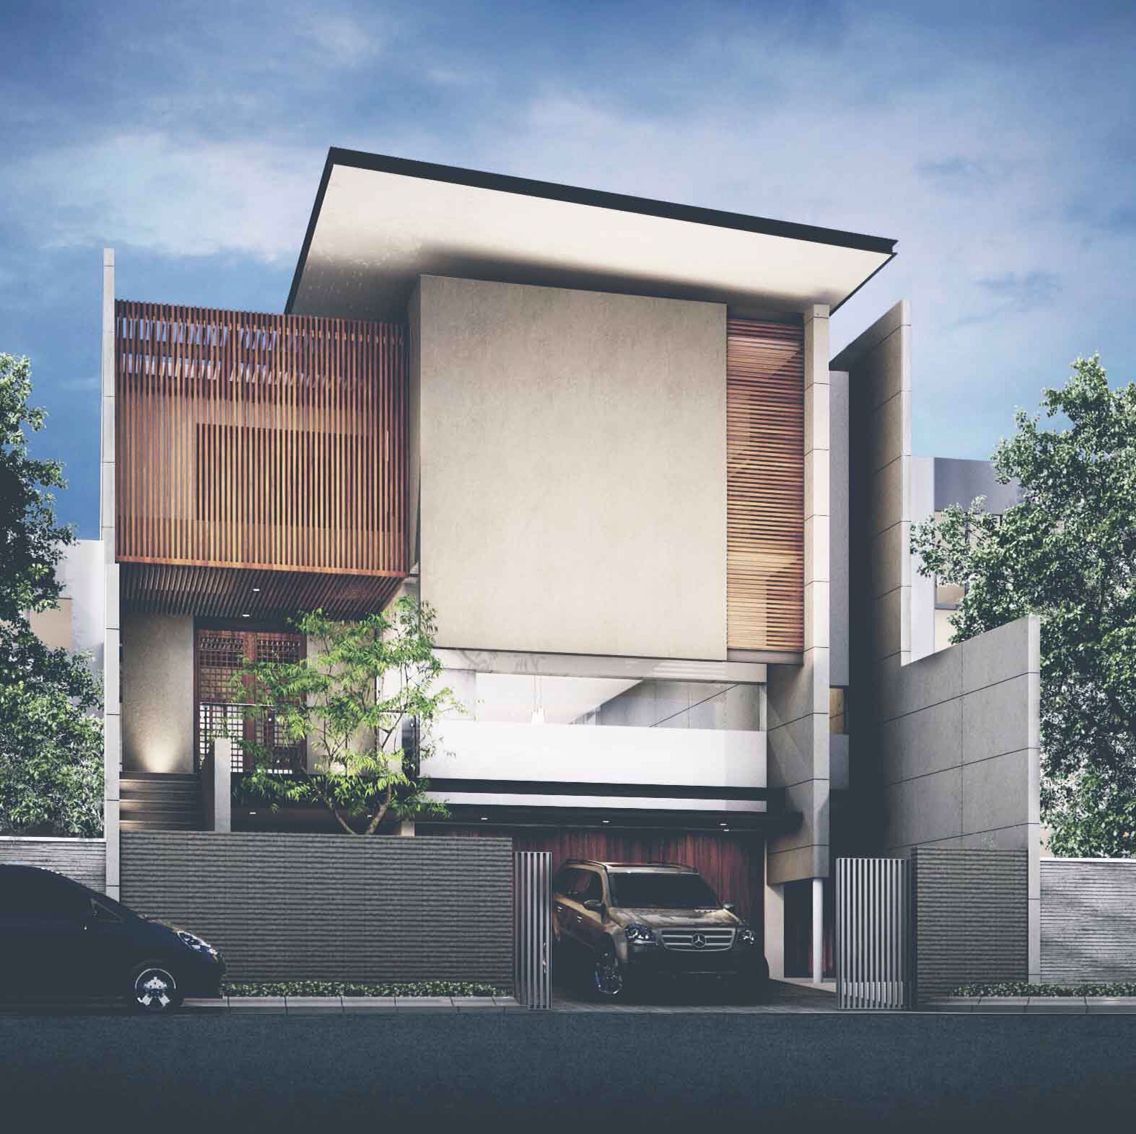 Portfolio Modern Home Design: Follow My Insta @zosmastudio